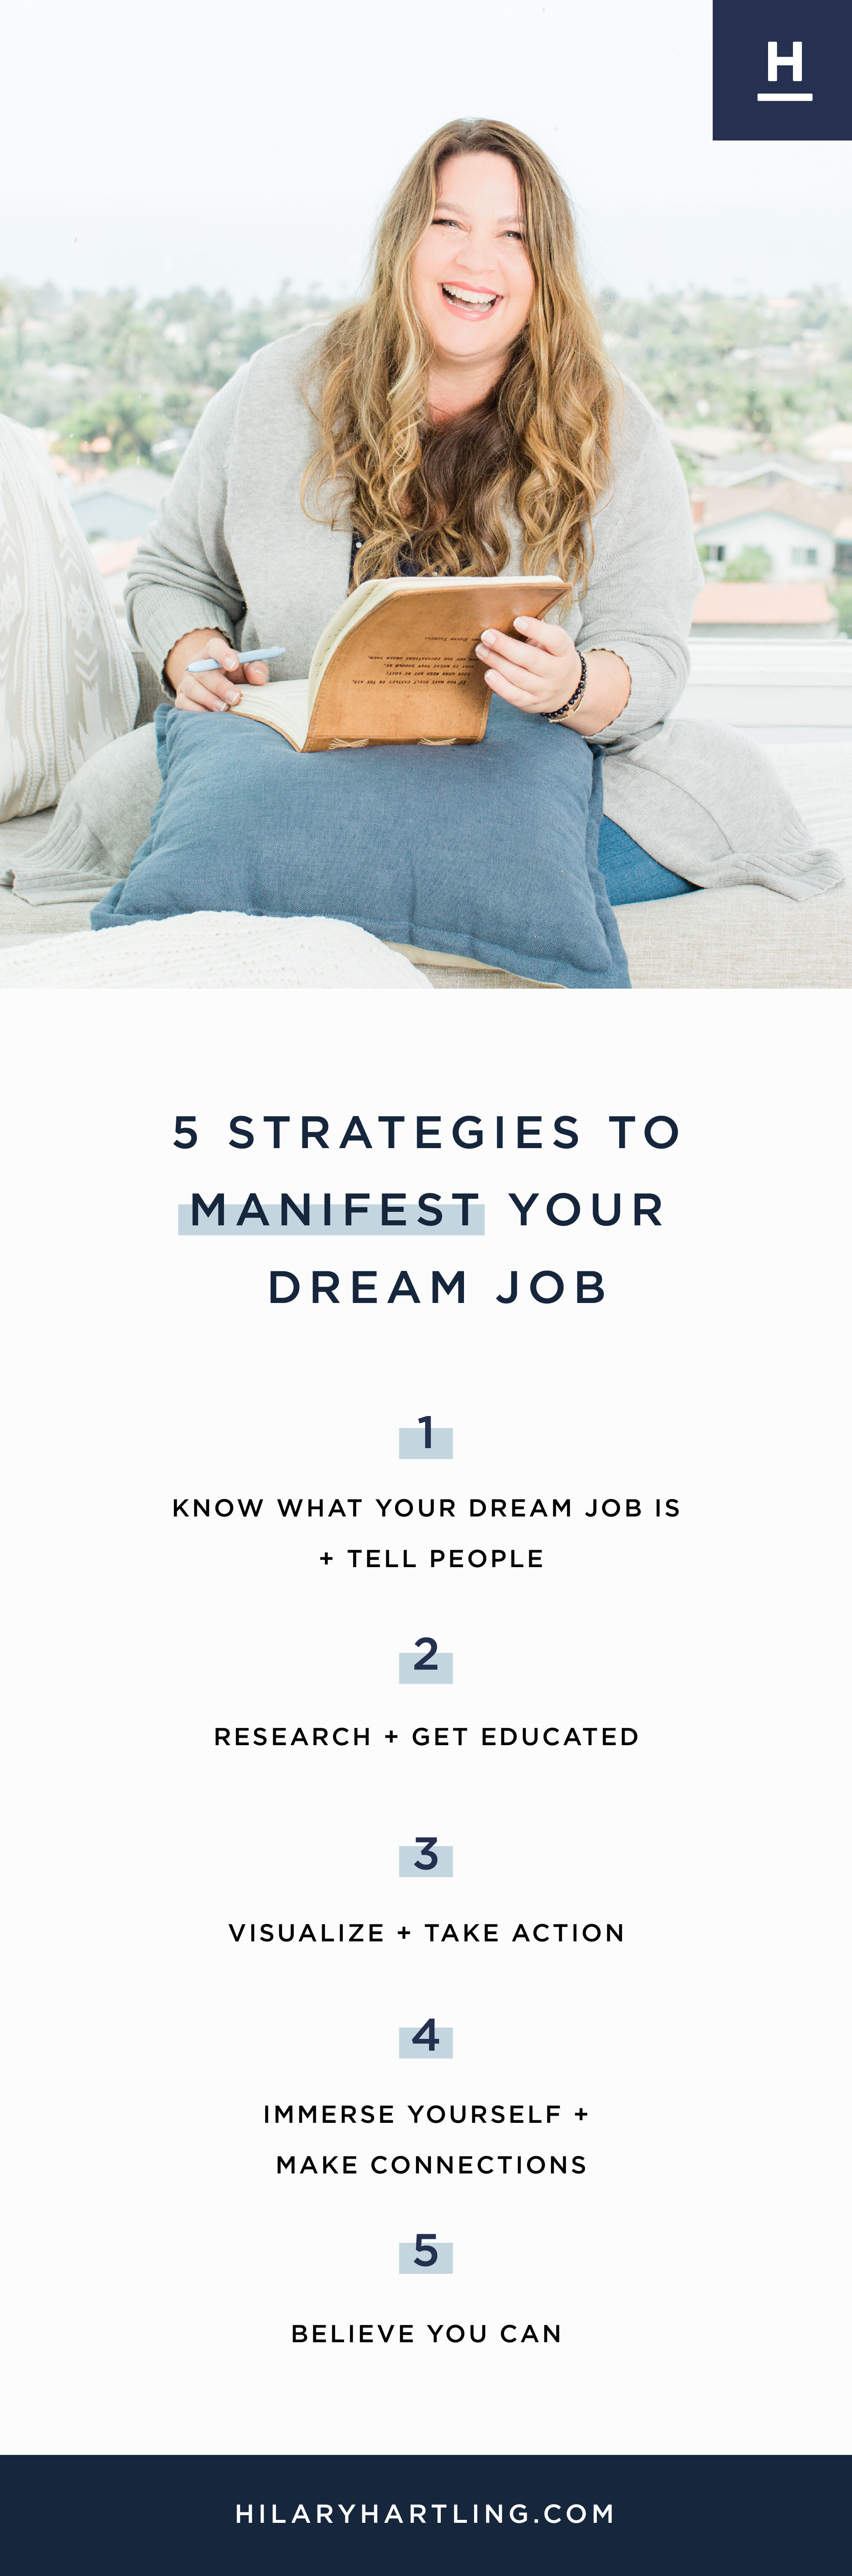 manifest-your-dream-job.jpg